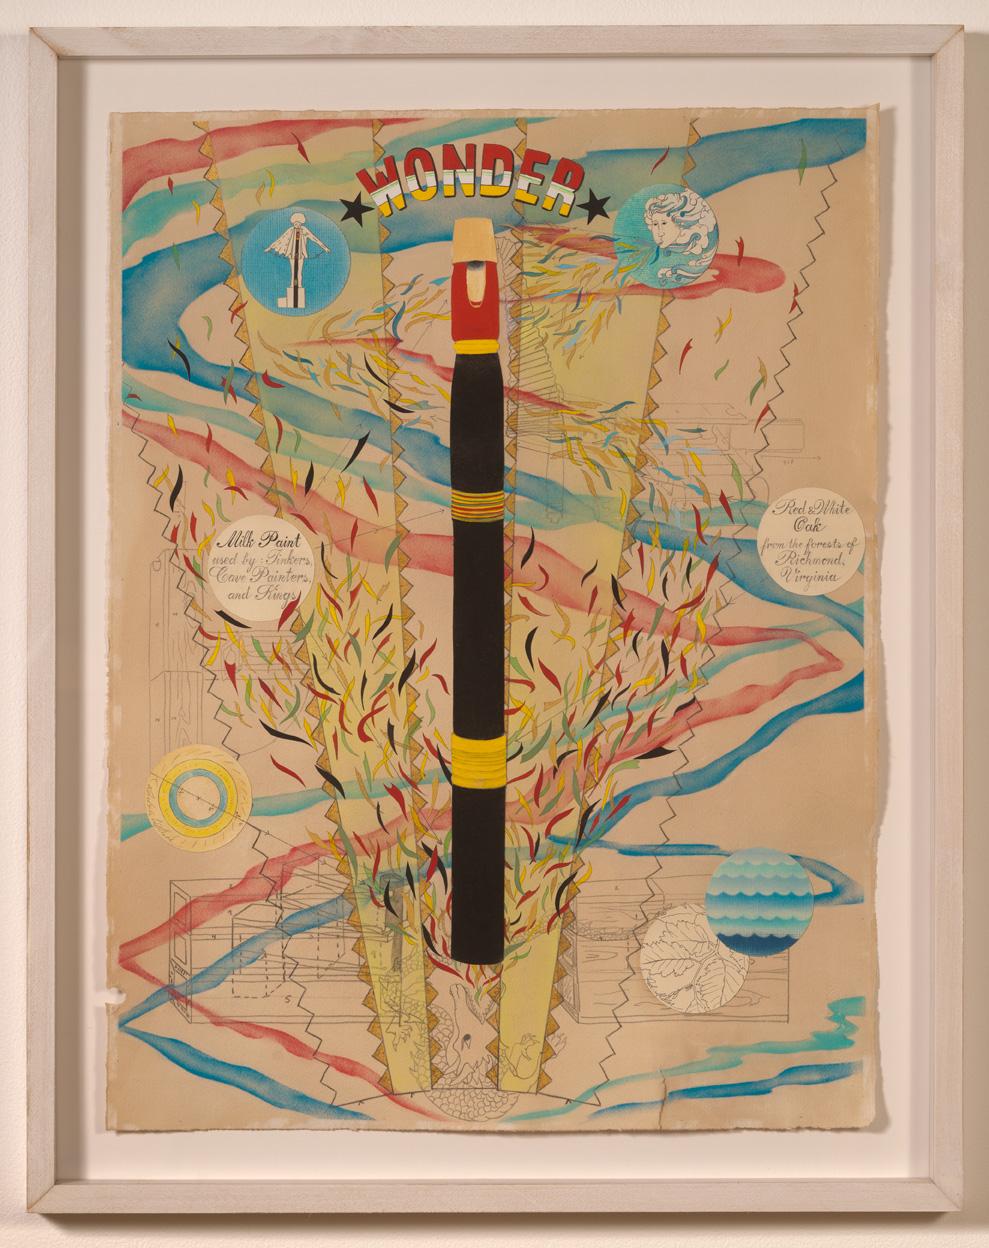 Untitled (Wonder). Rotem Tamir & Amber D. Kempthorn. Pastel, ink, graphite, gouache, milk paint, charcoal, collage.